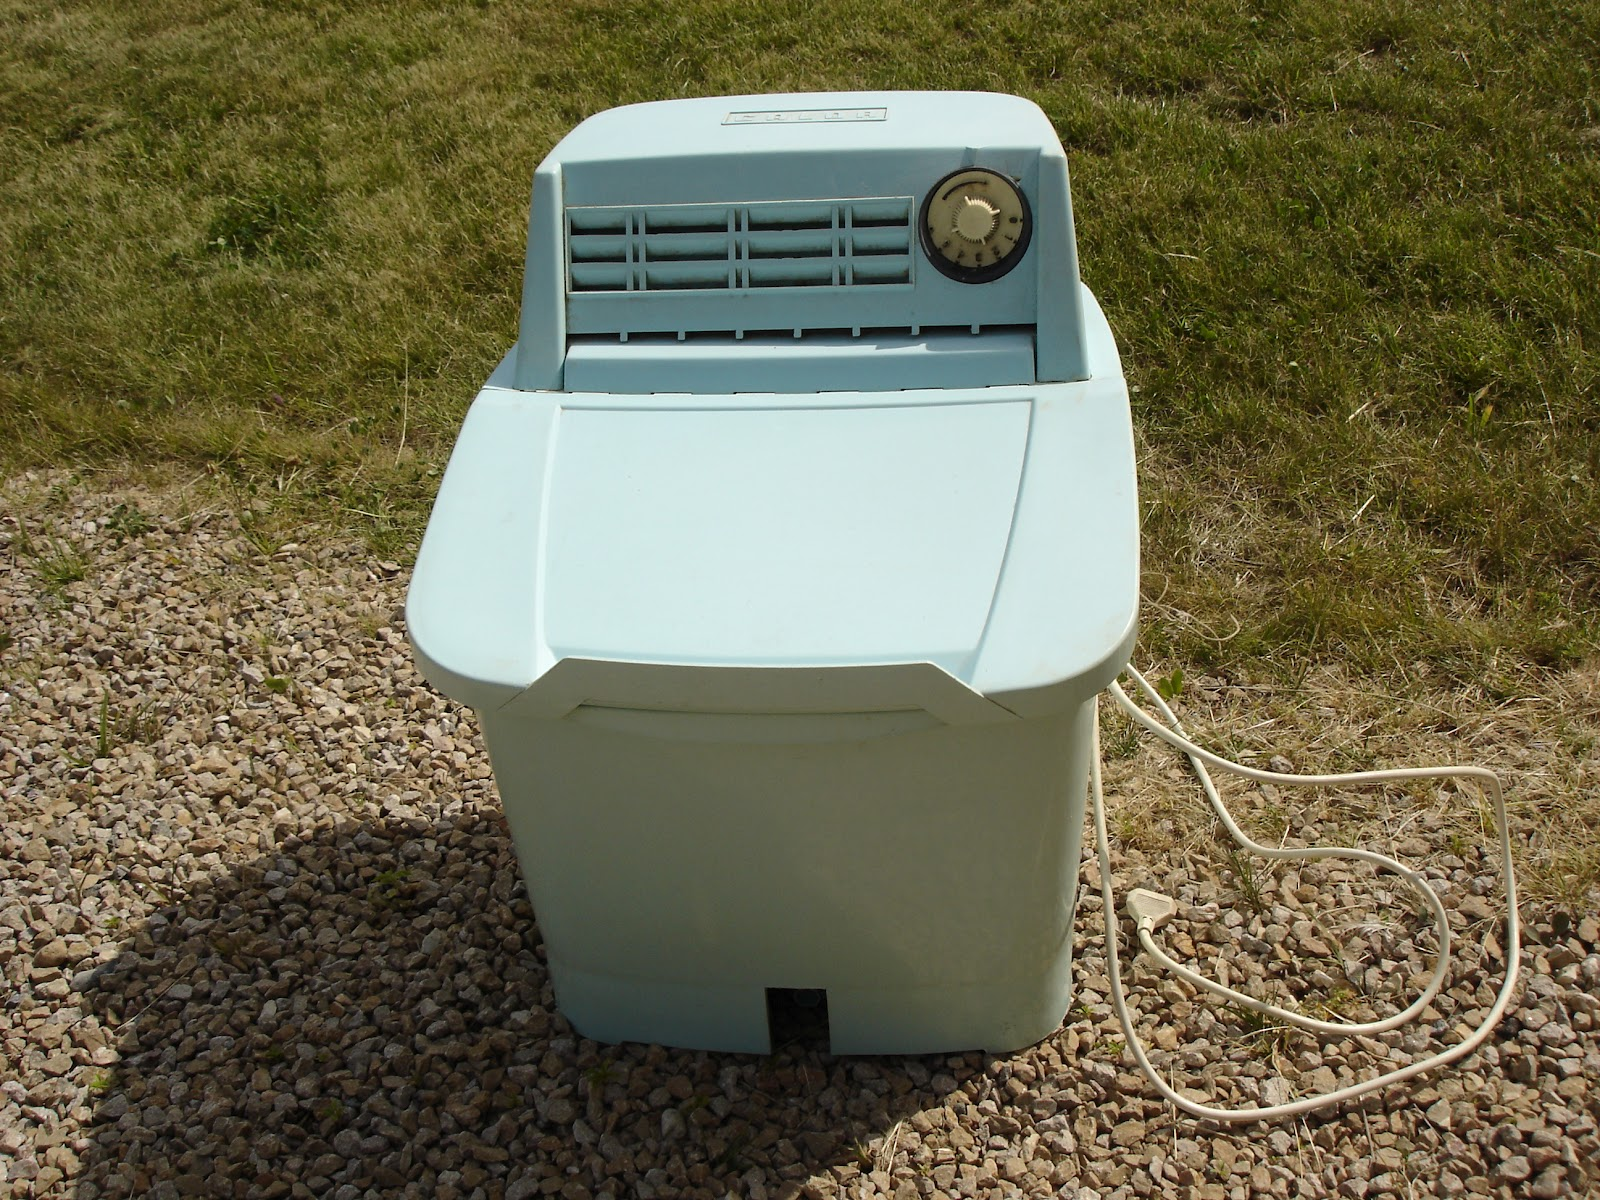 dressing grenier machine laver lectrique calor. Black Bedroom Furniture Sets. Home Design Ideas